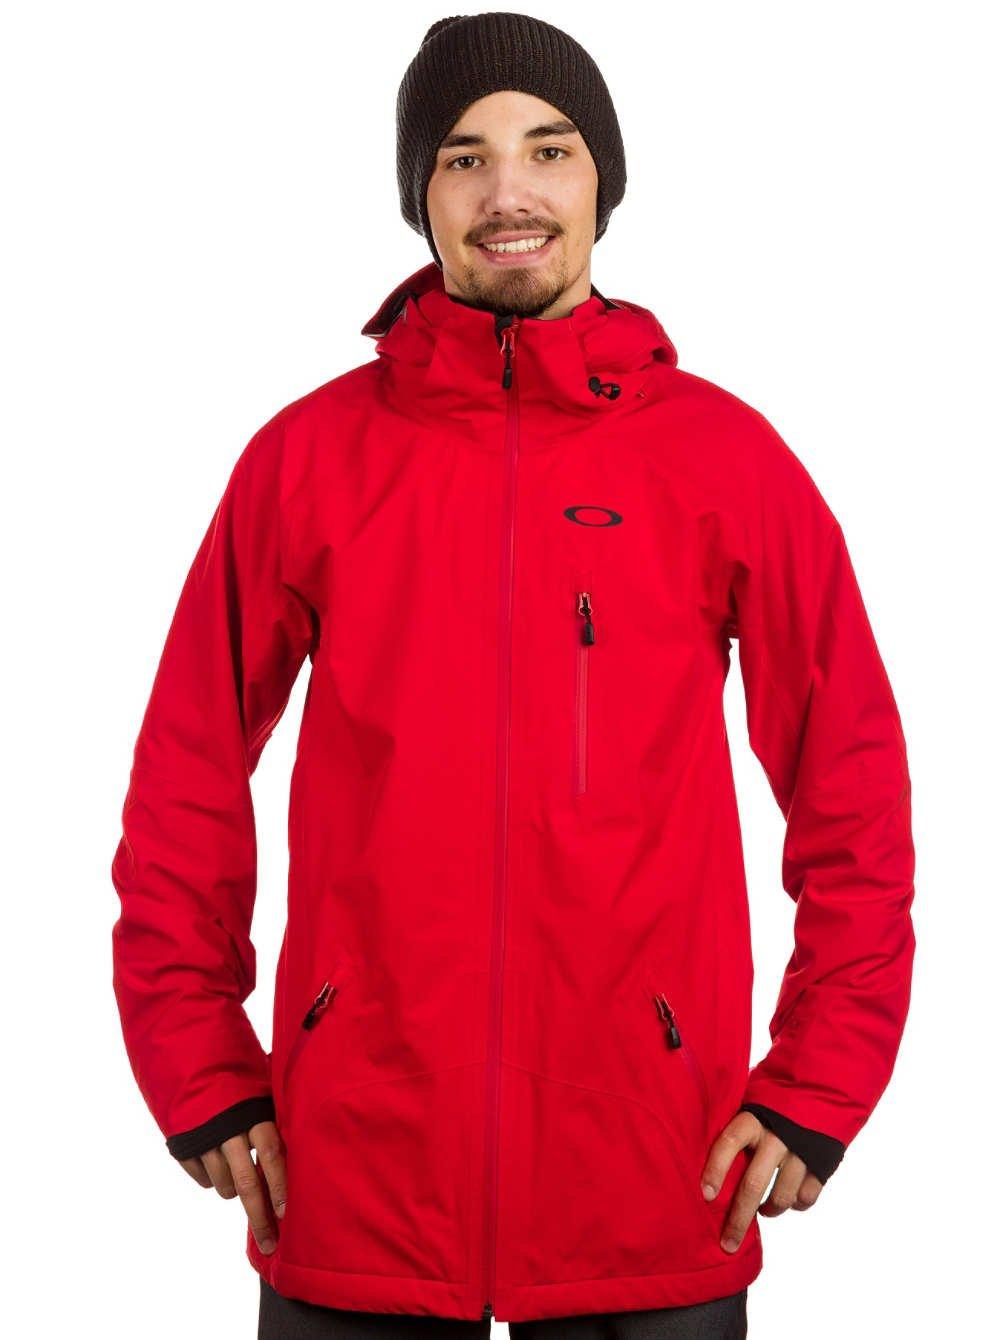 Herren Snowboard Jacke Oakley Sikorsky Gore-Tex Jacket günstig